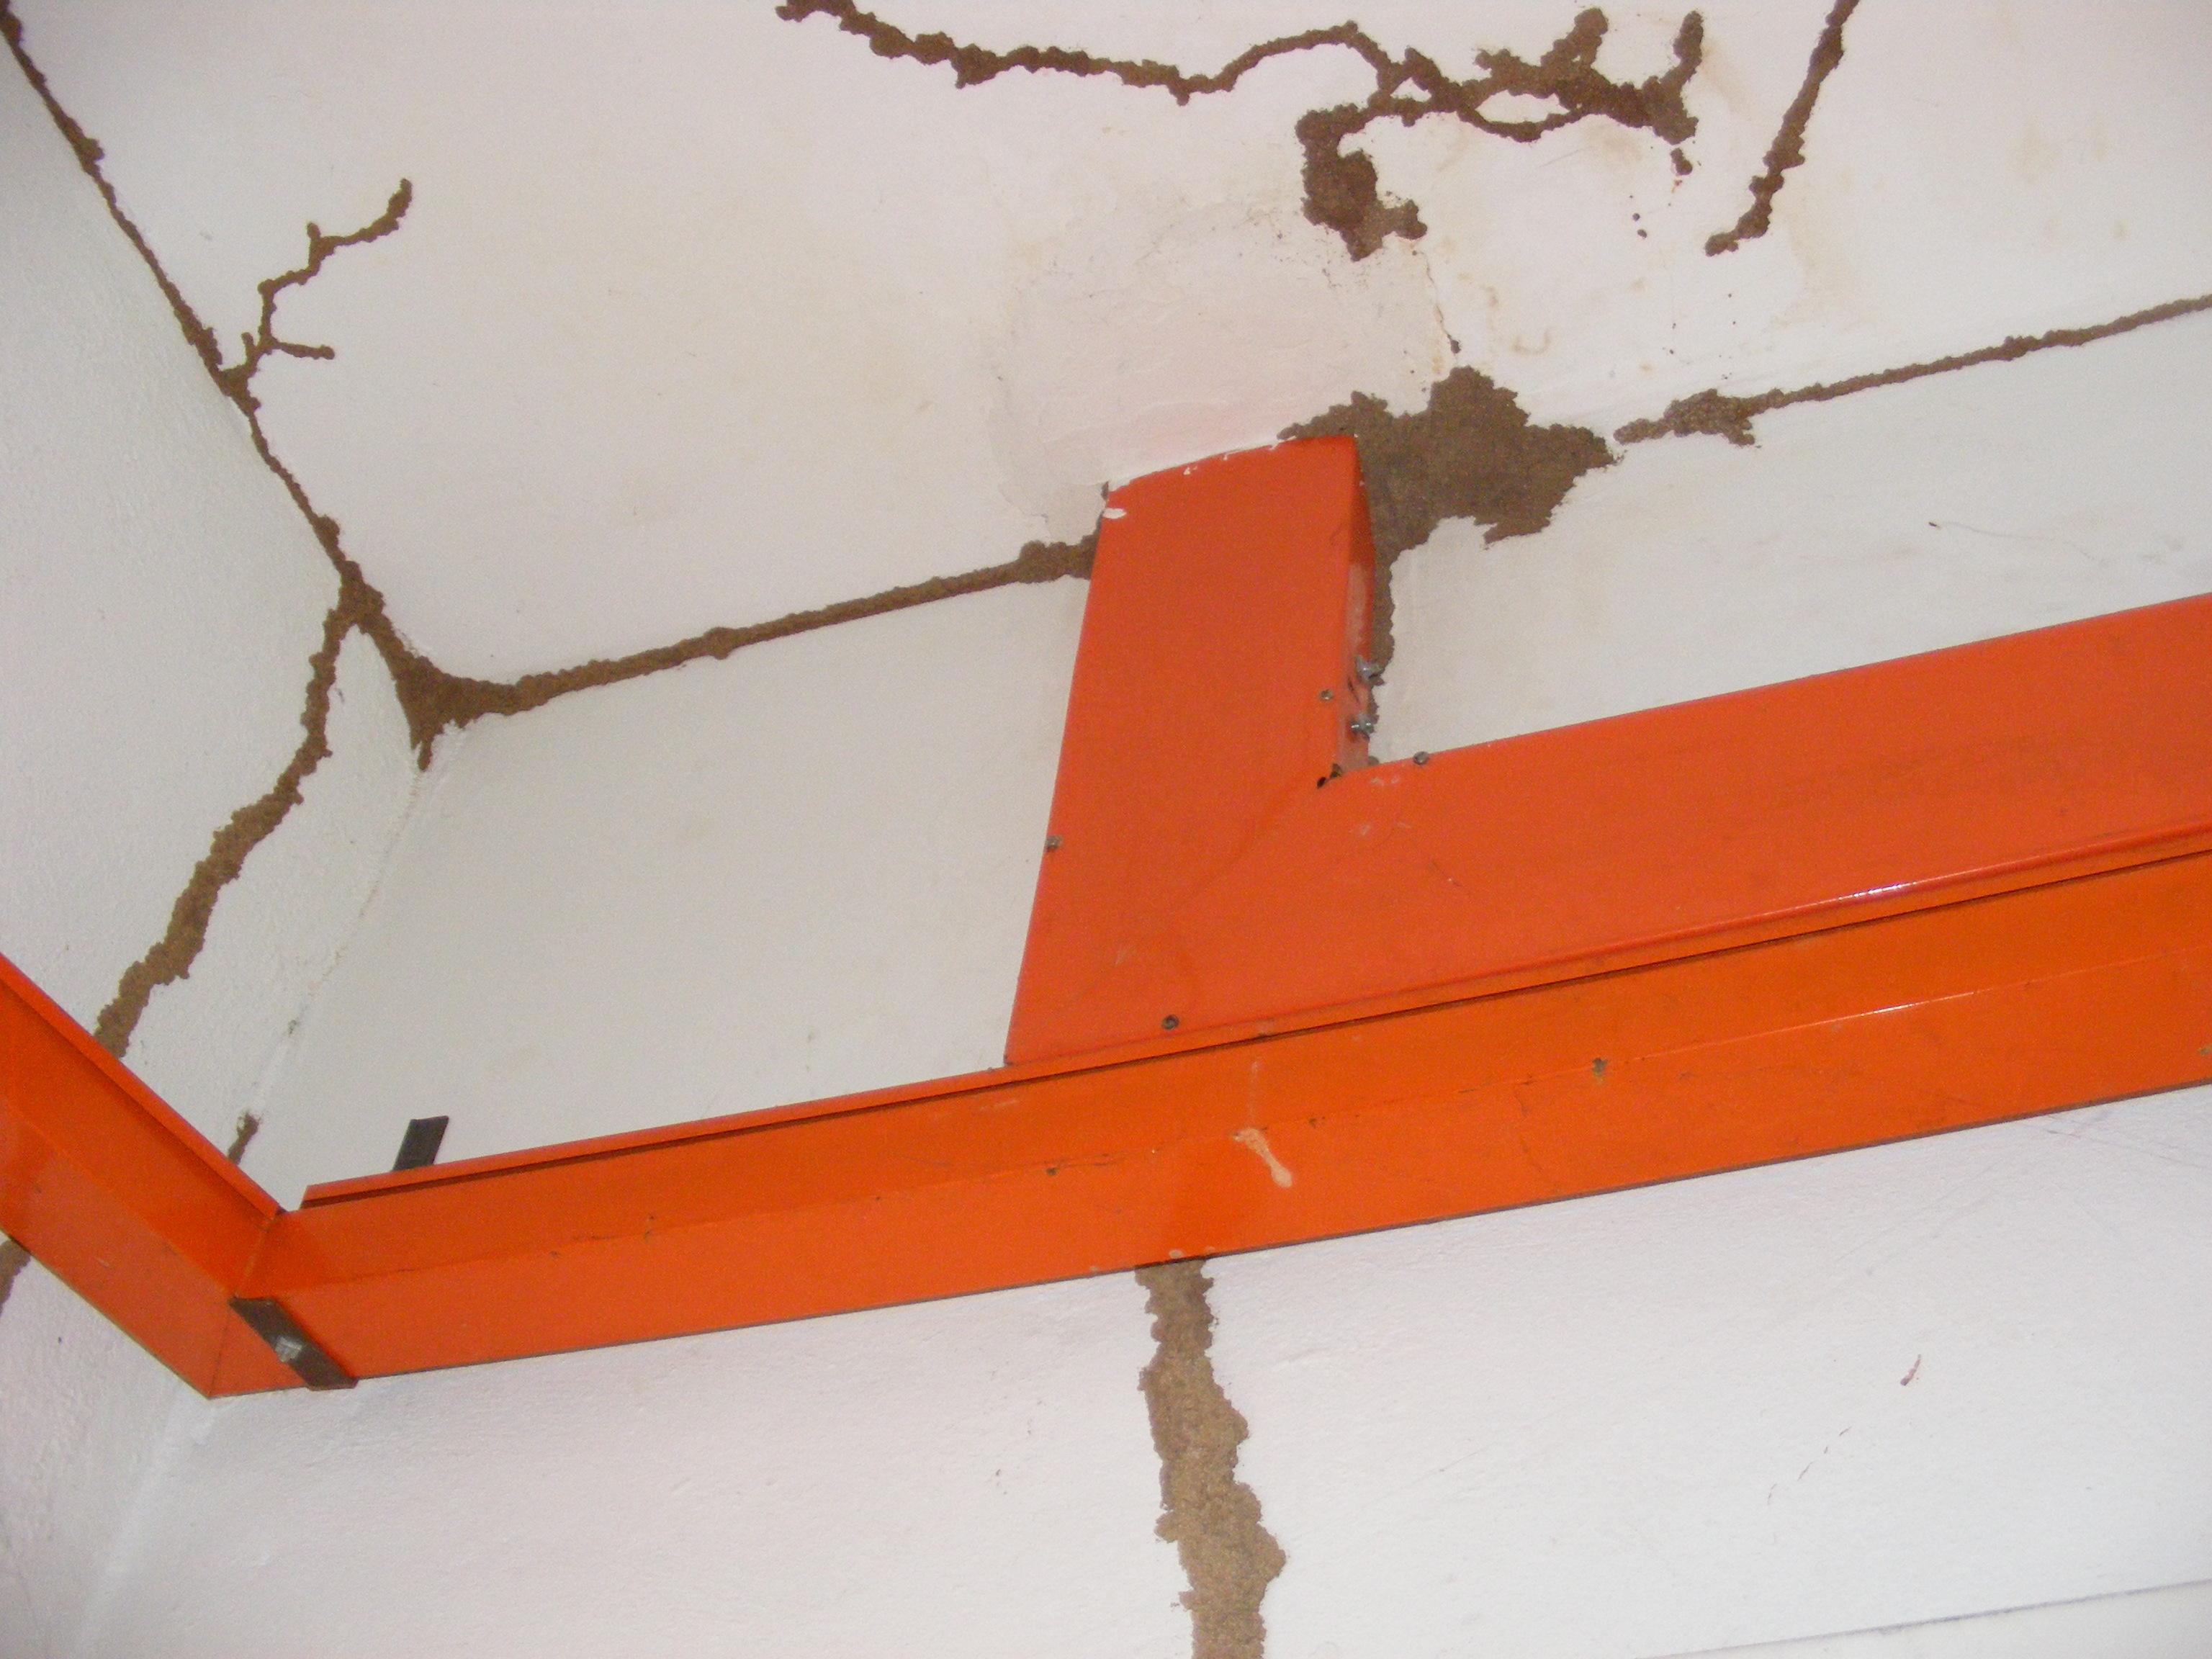 ALNASS Pest Control & Hygiene - Termite Mud Tubes